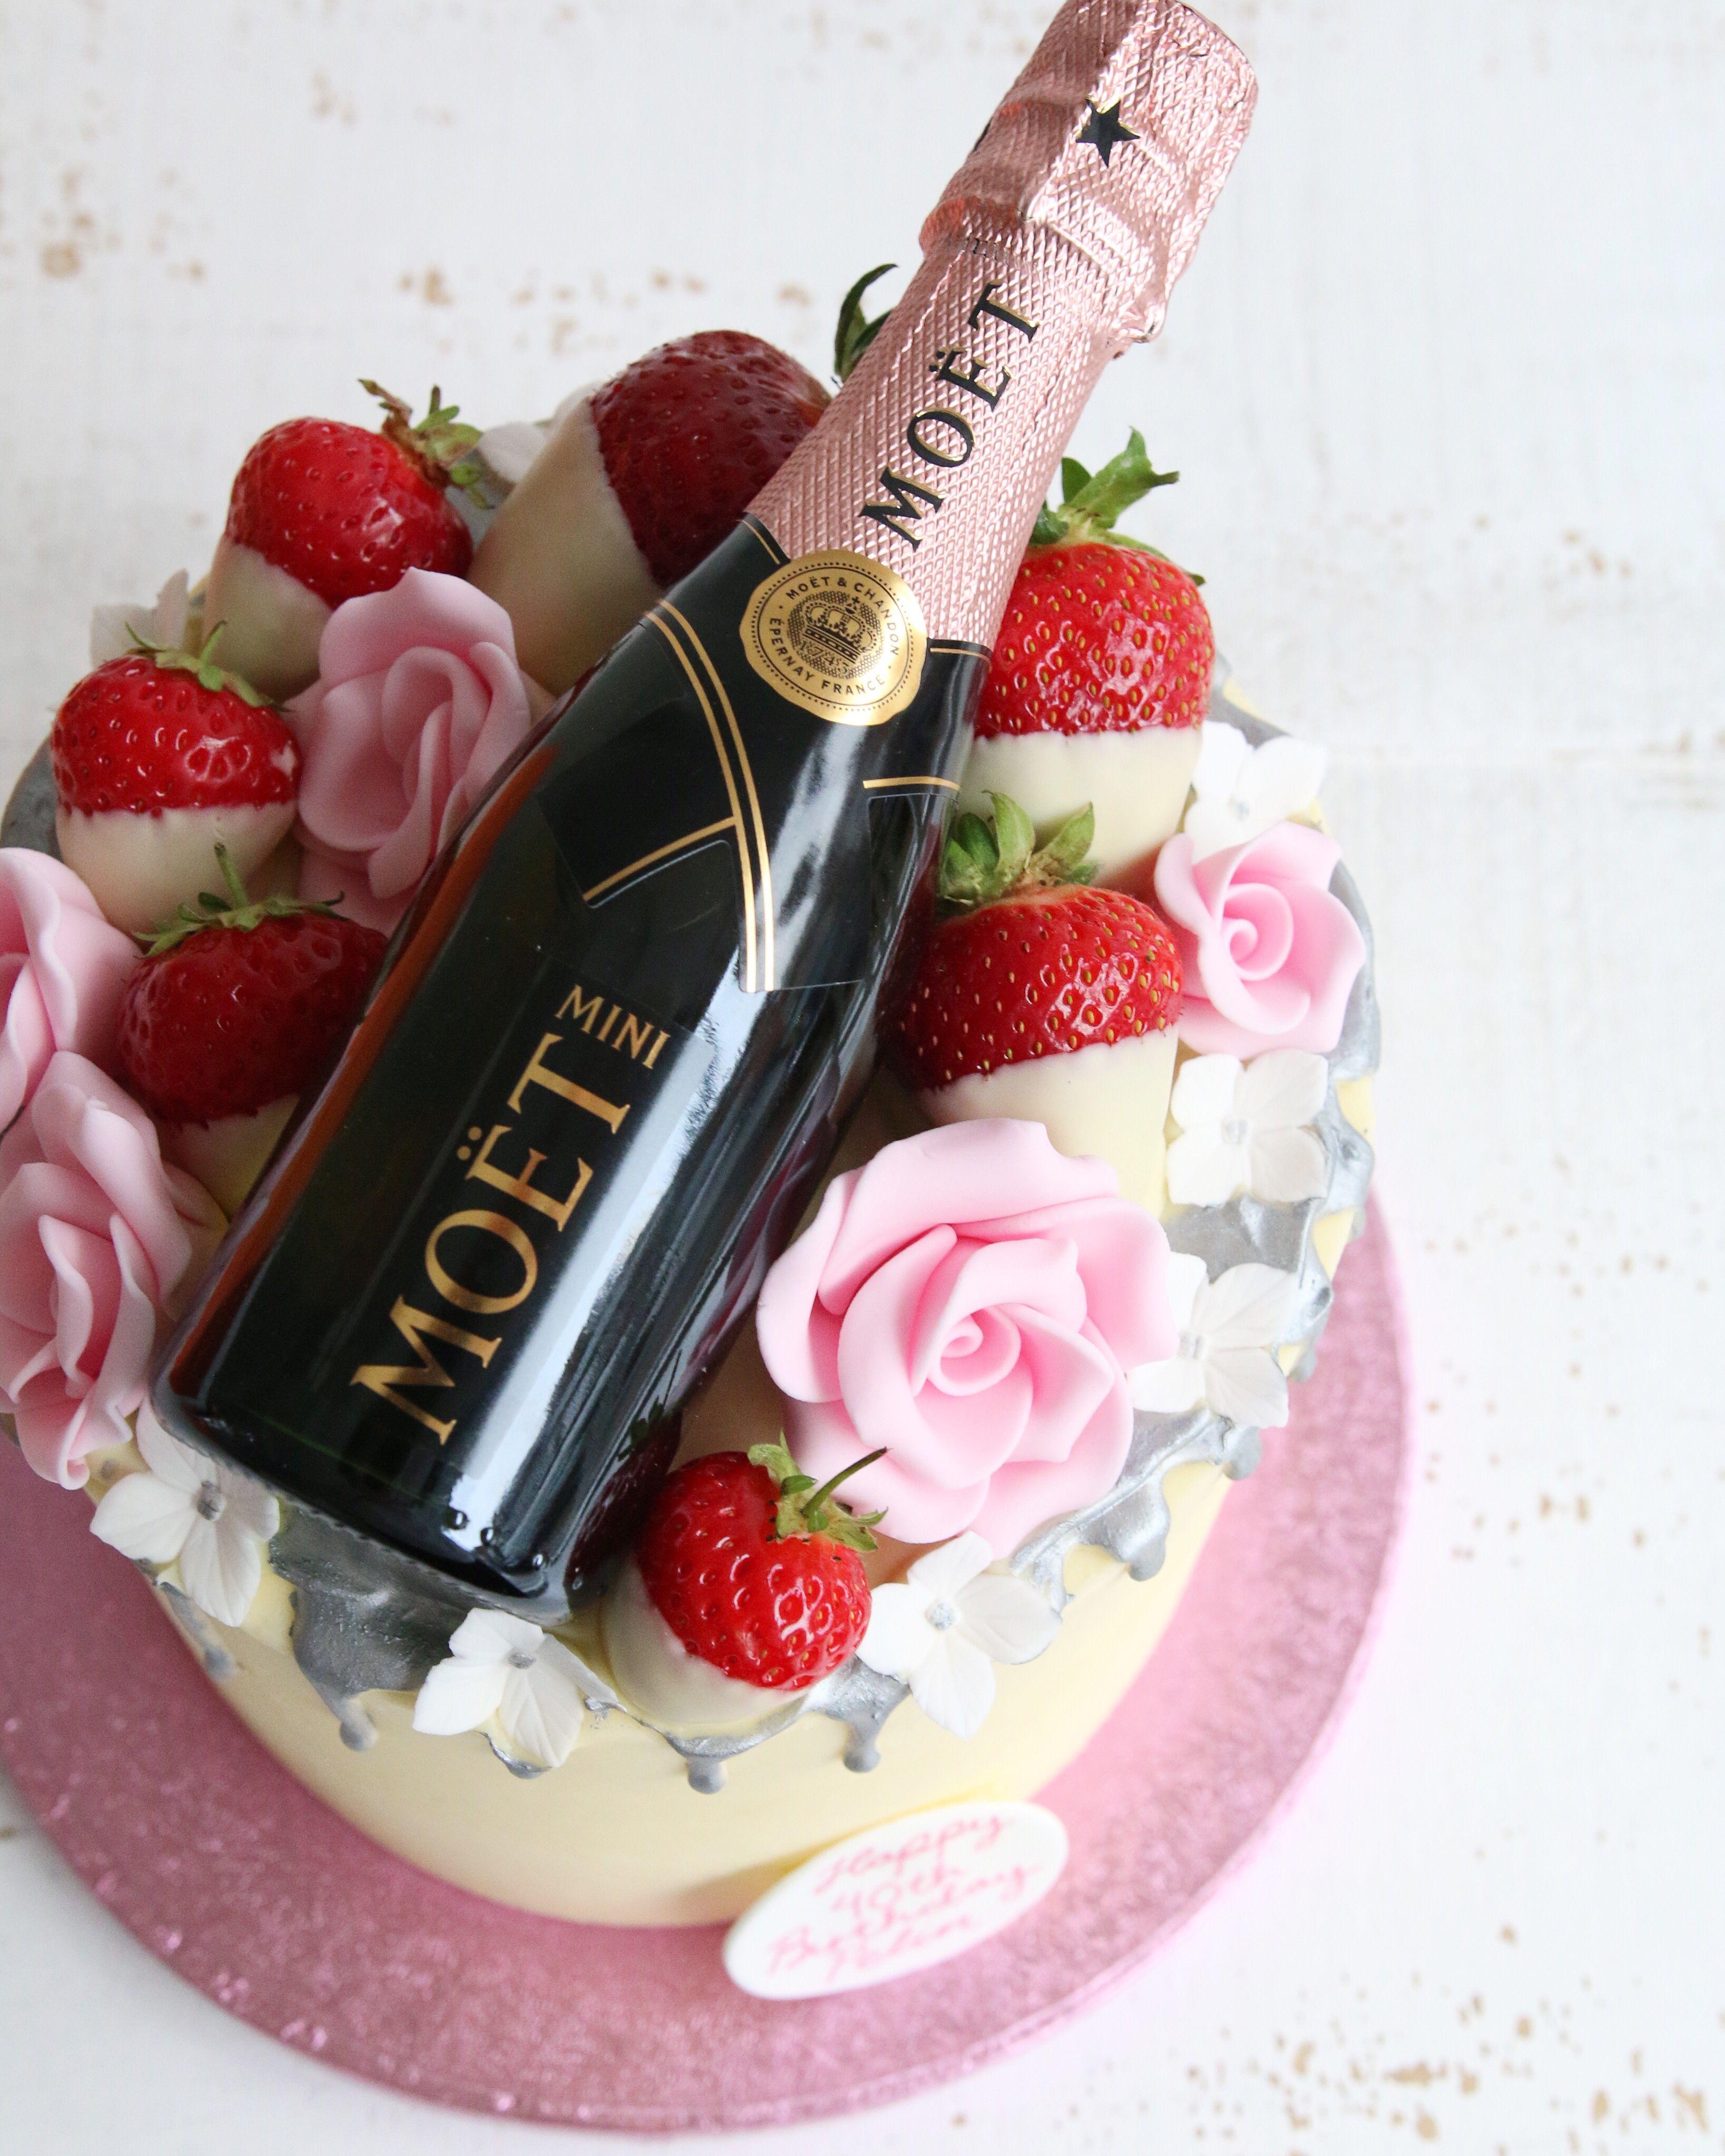 Buttercream Drip Cakes Champagne Birthday Drip Cakes Birthday Drip Cake